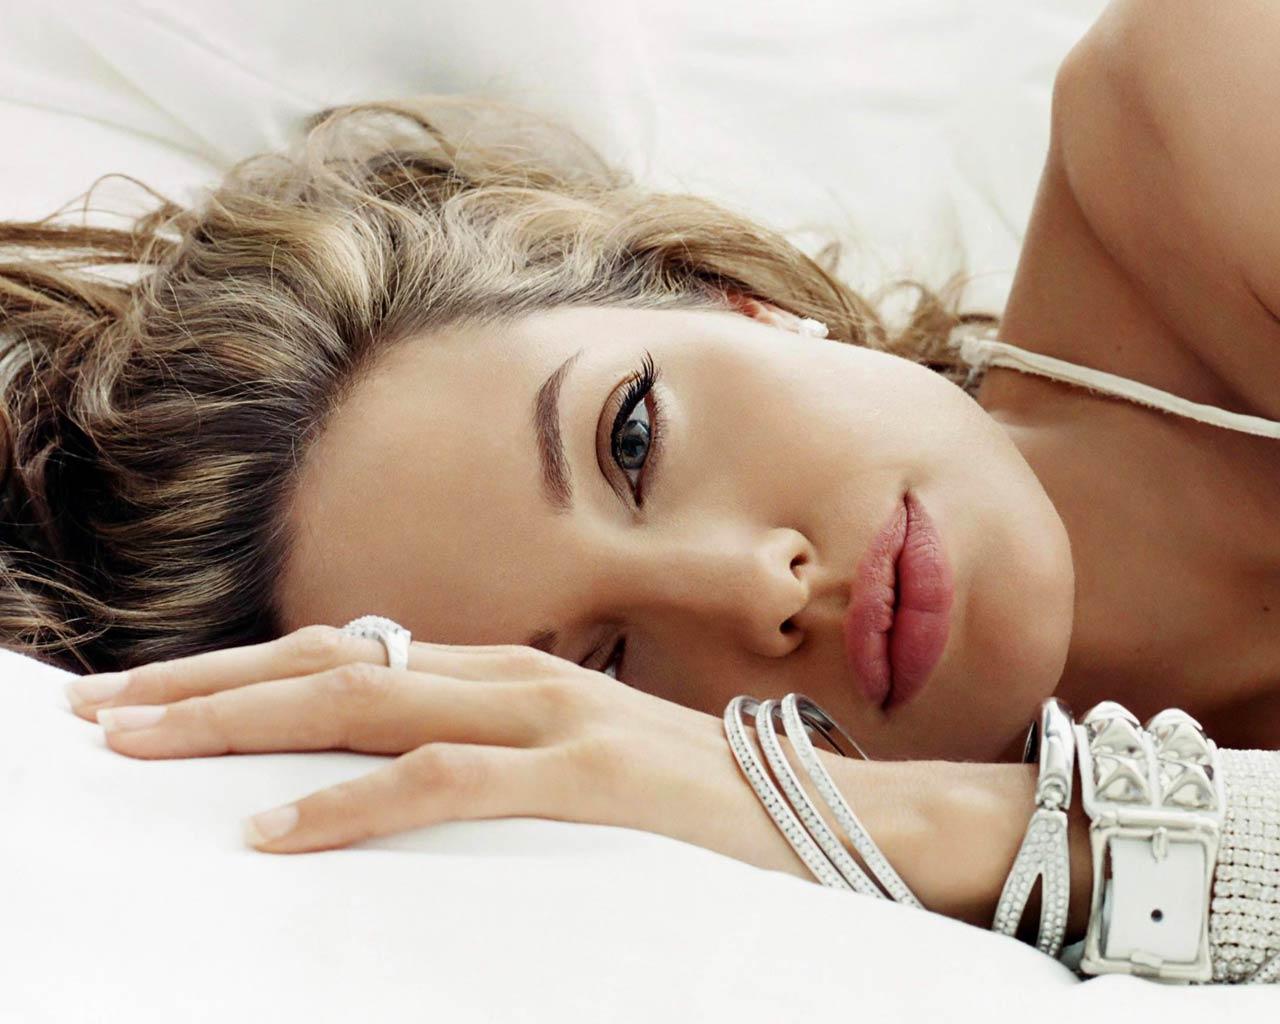 http://1.bp.blogspot.com/-Km1uGYNeoiw/TkuvvjIlMPI/AAAAAAAAAI4/vFyj34pdmh0/s1600/angelina-jolie-3.jpg